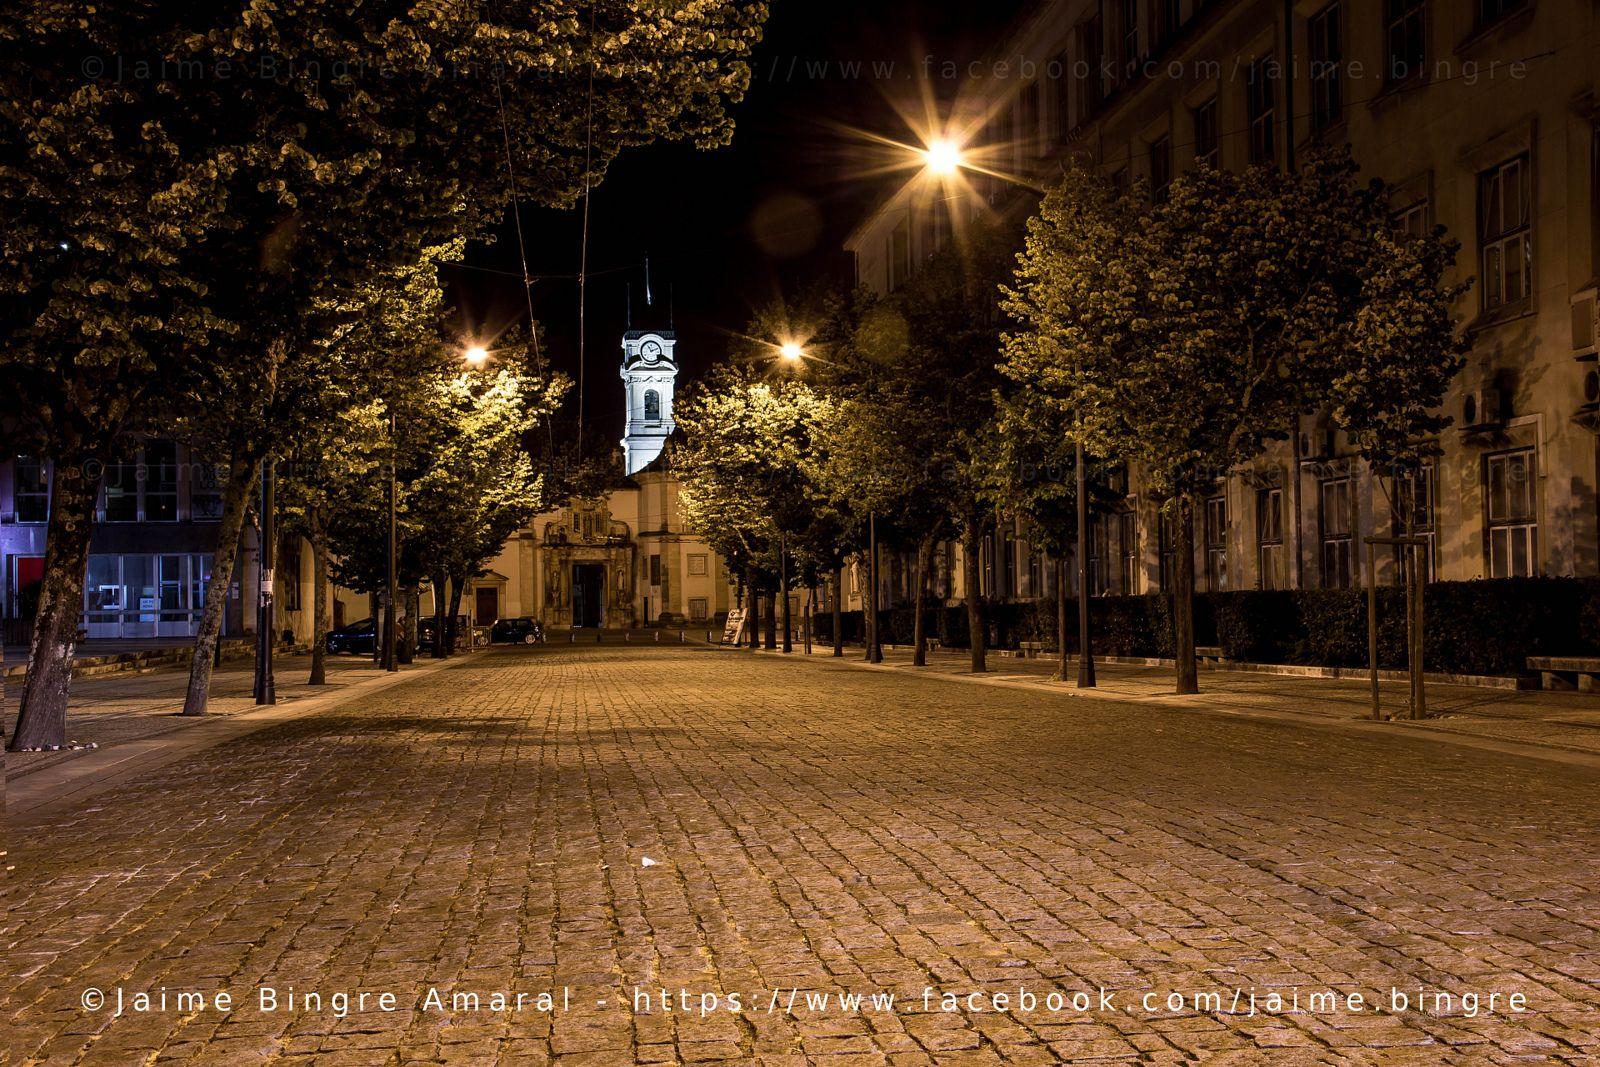 https://flic.kr/p/eWyraD | Universidade de Coimbra , lado Este / University of Coimbra, East side | Porta Férrea